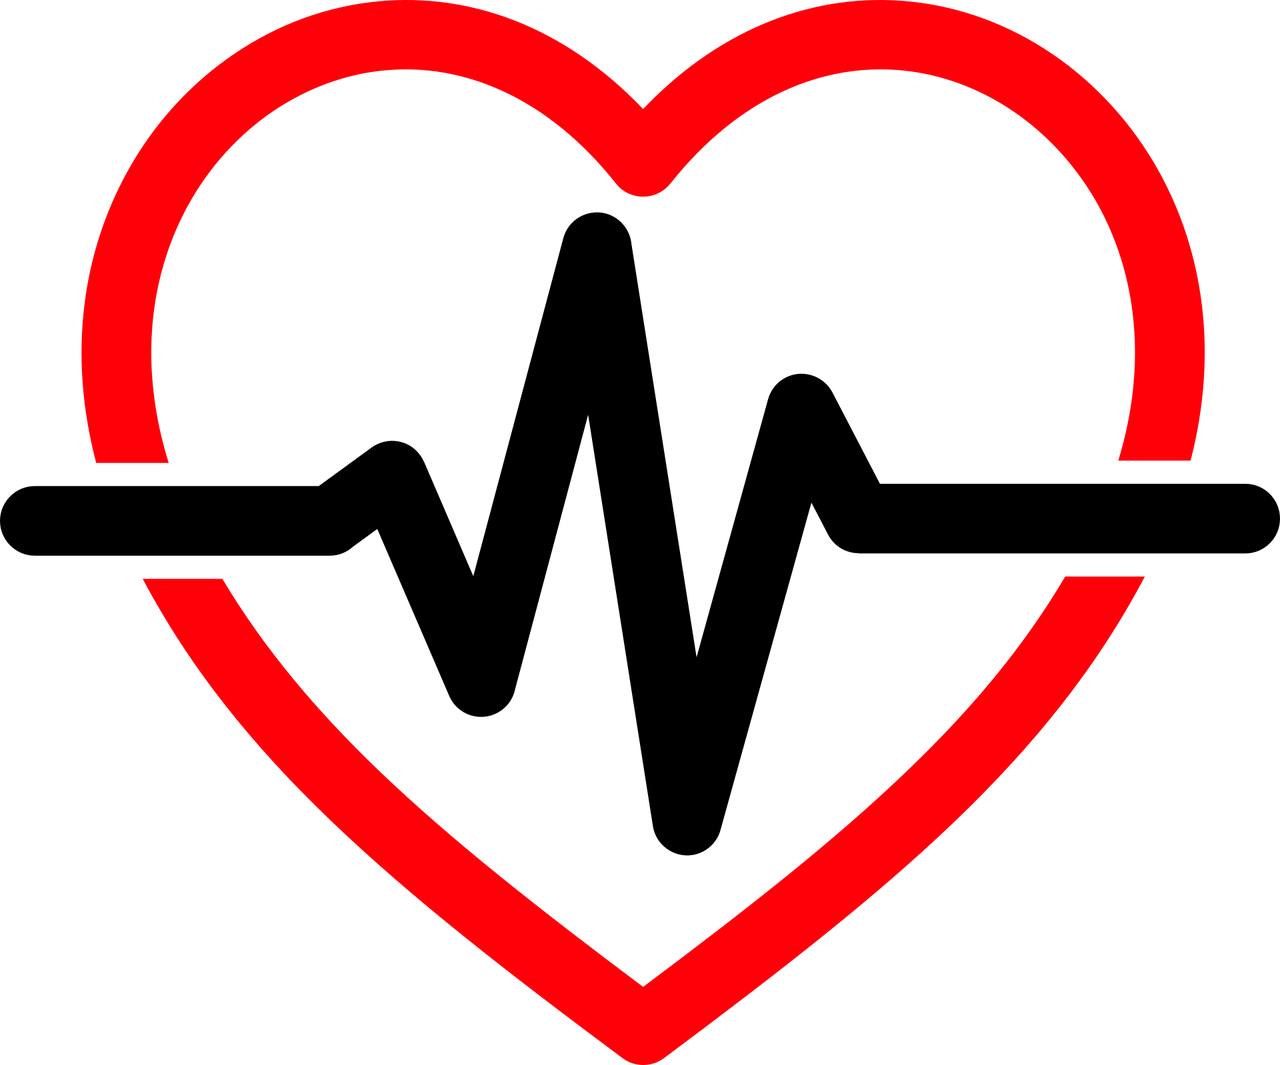 reanimatiecursus hartveilig lauwersoog